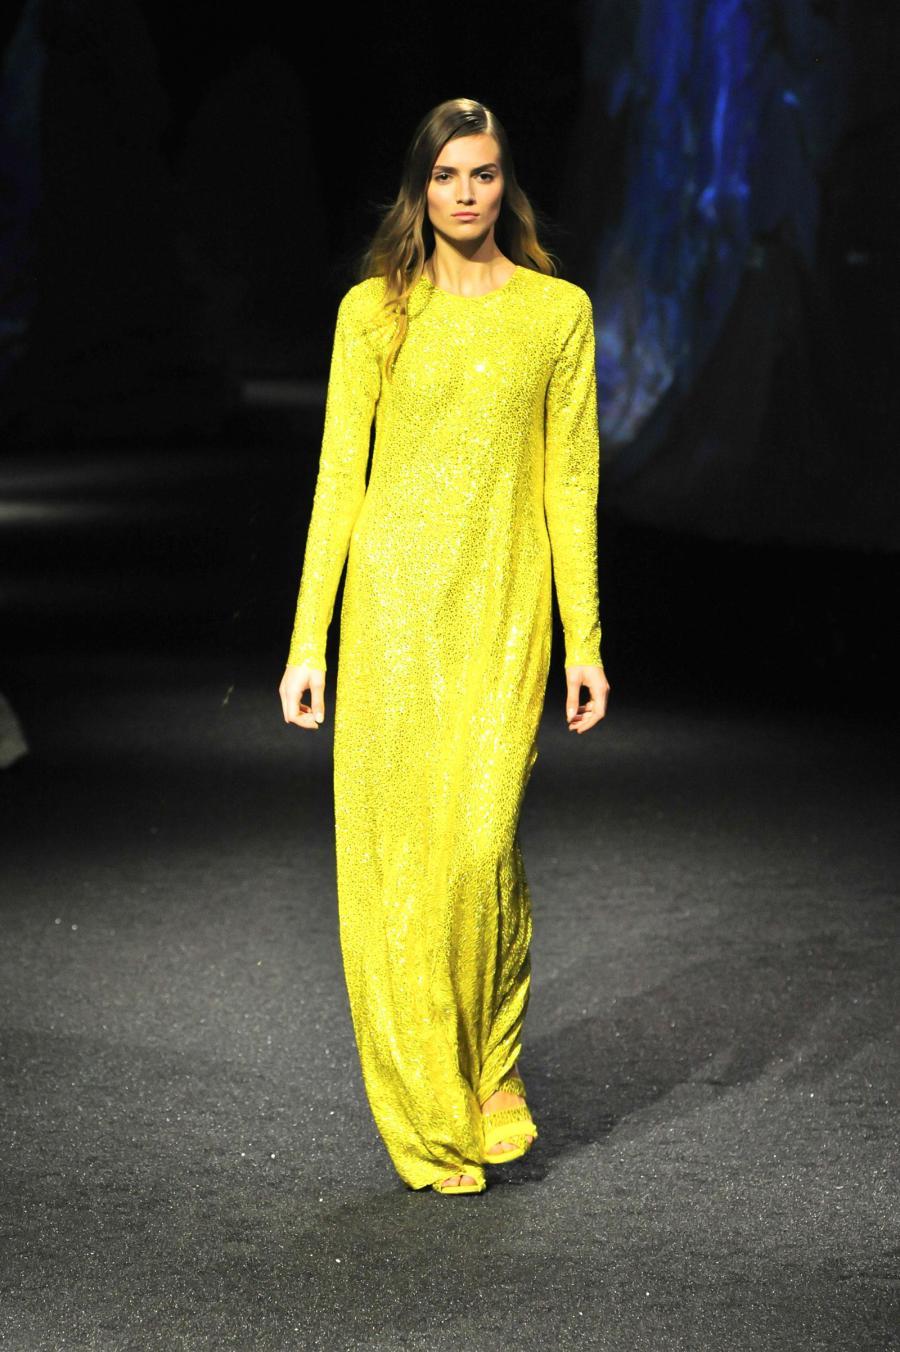 philipp-plein-women-s-fashion-show-ss15-57-20140922364602